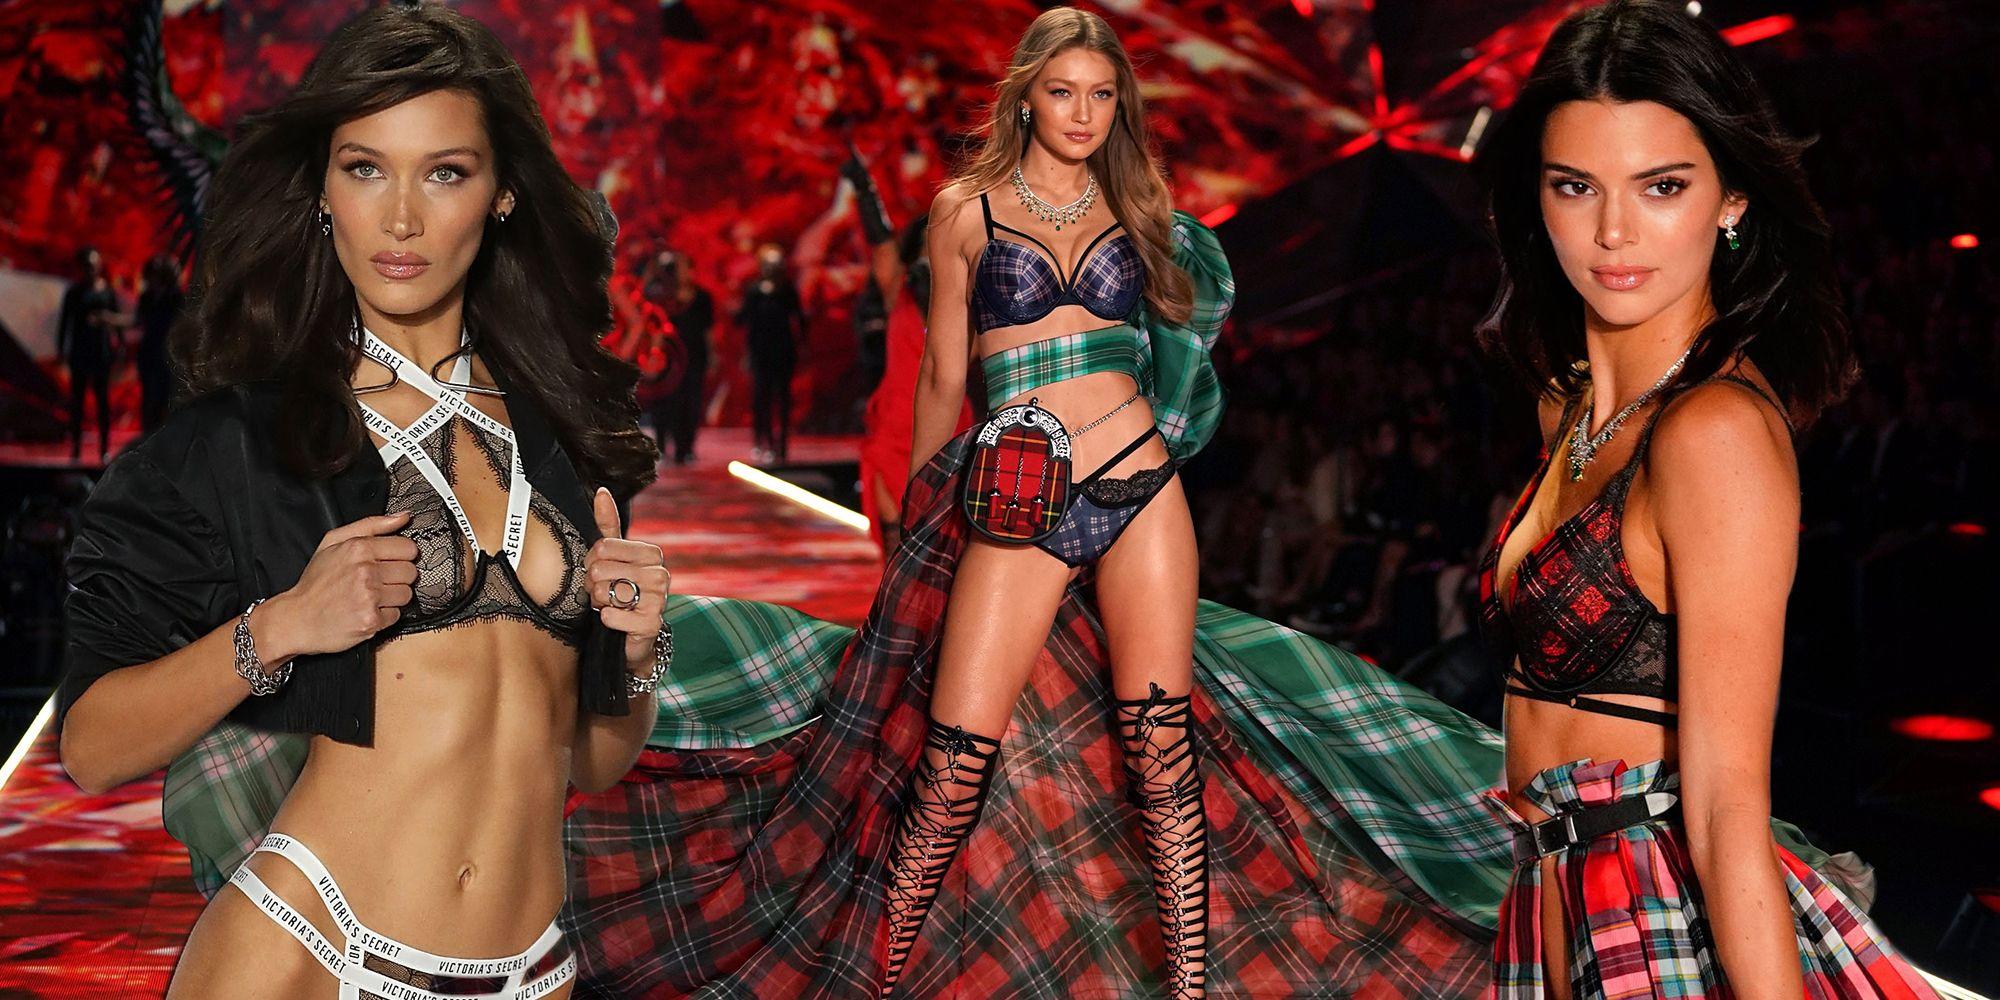 Victoria S Secret Fashion Show 2018 Kendall Jenner Gigi Hadid And